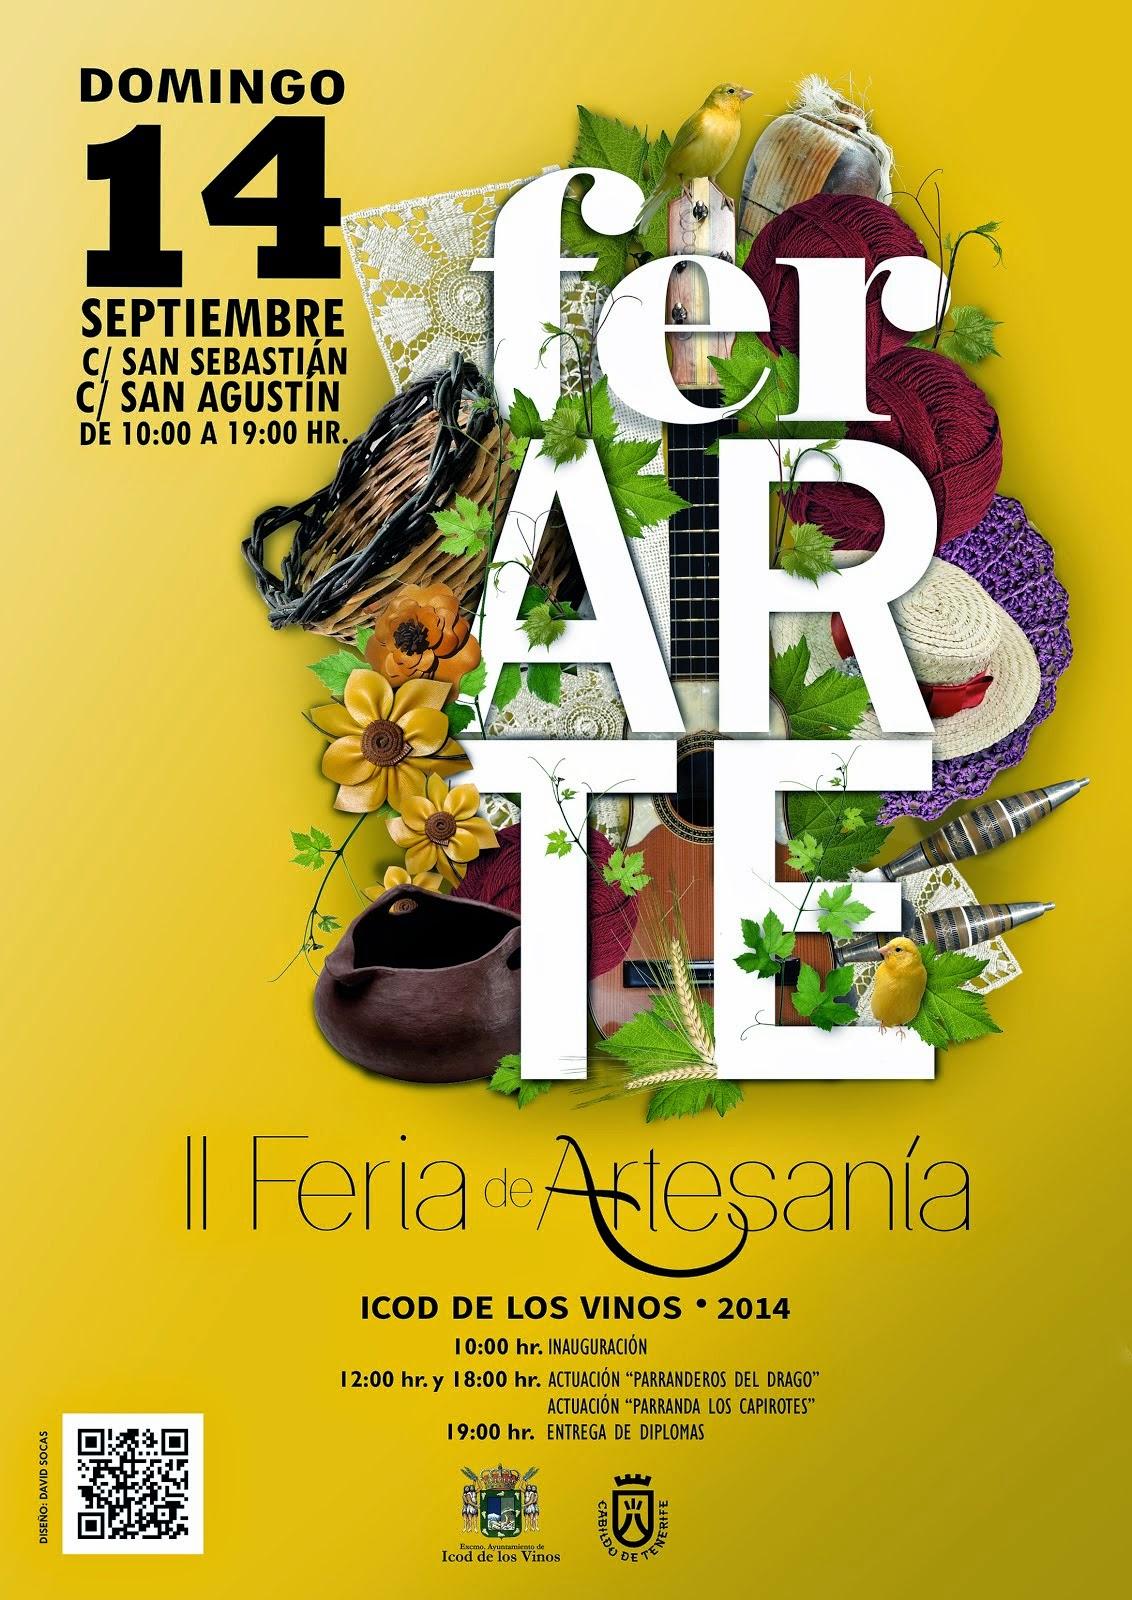 Feria de Artesanía FERARTE 2014